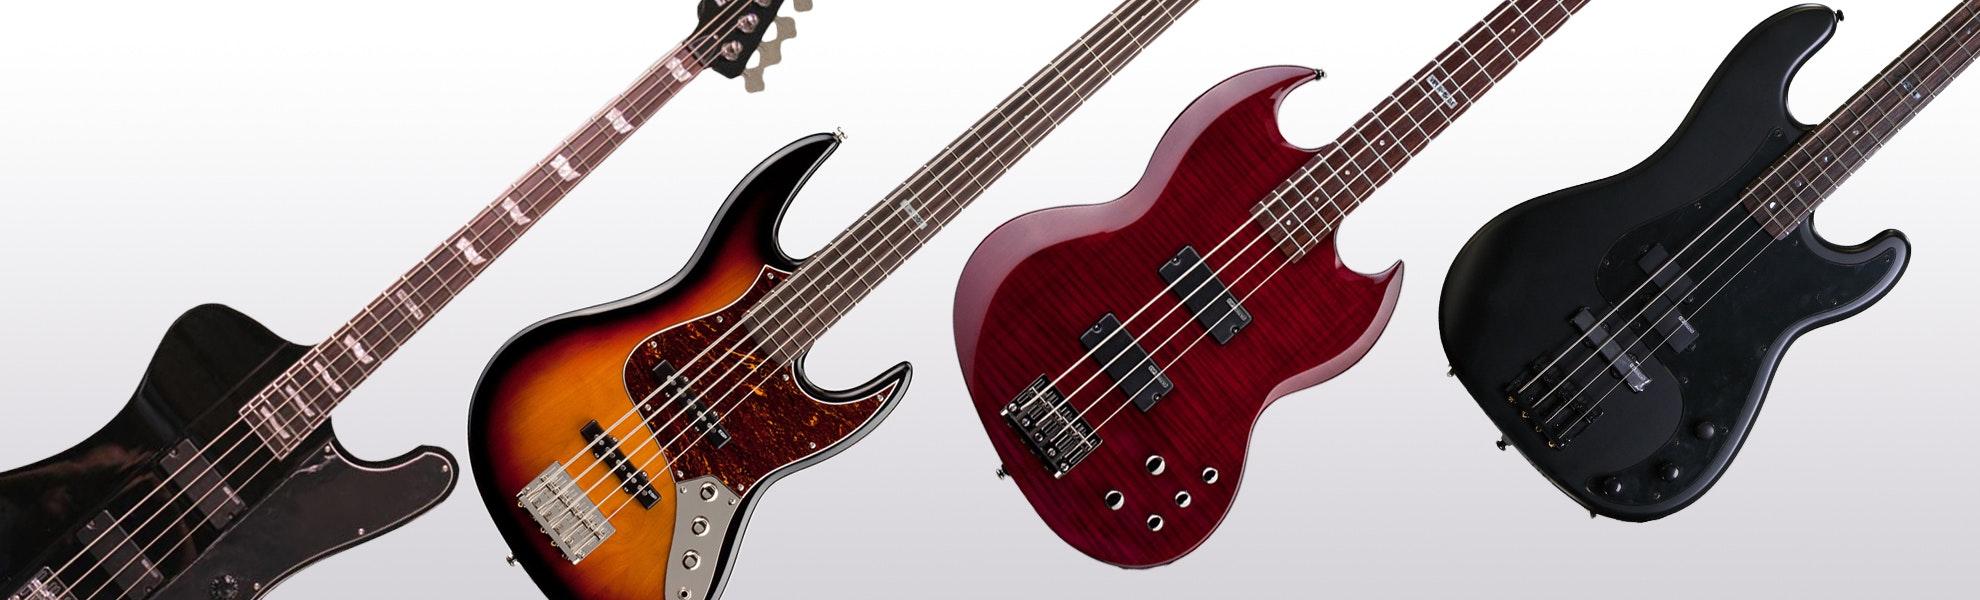 ESP LTD B-Stock Basses